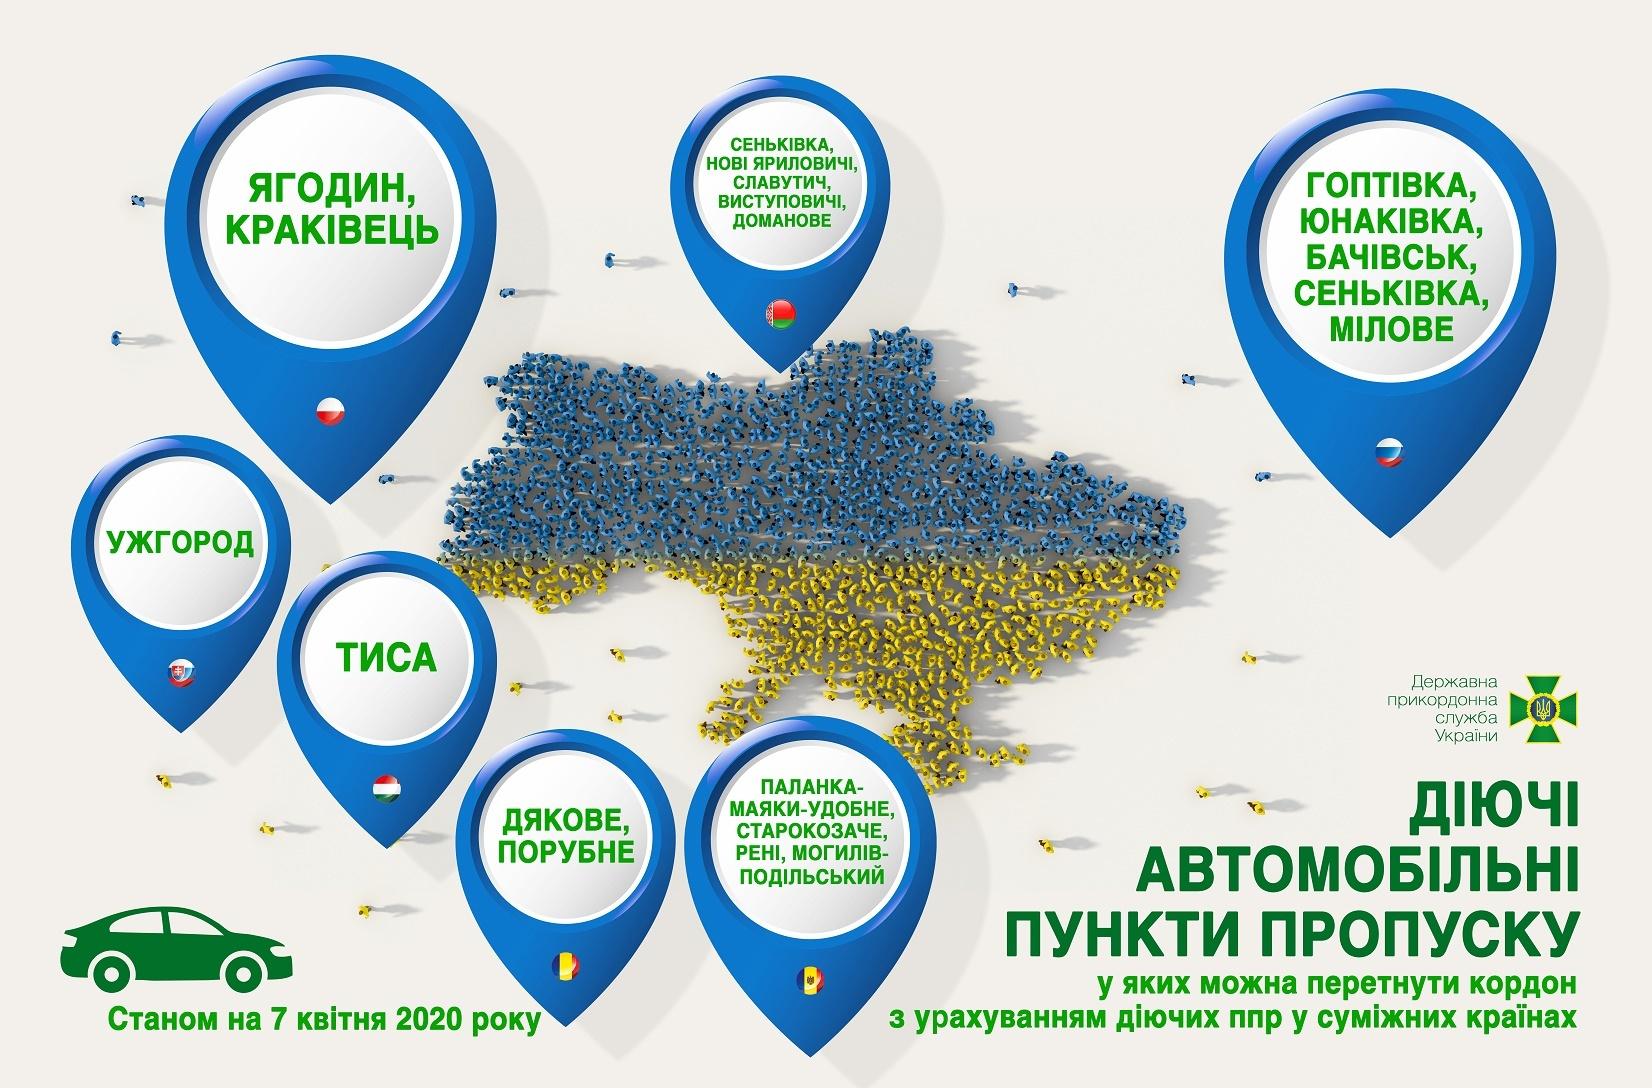 открытые границы украины